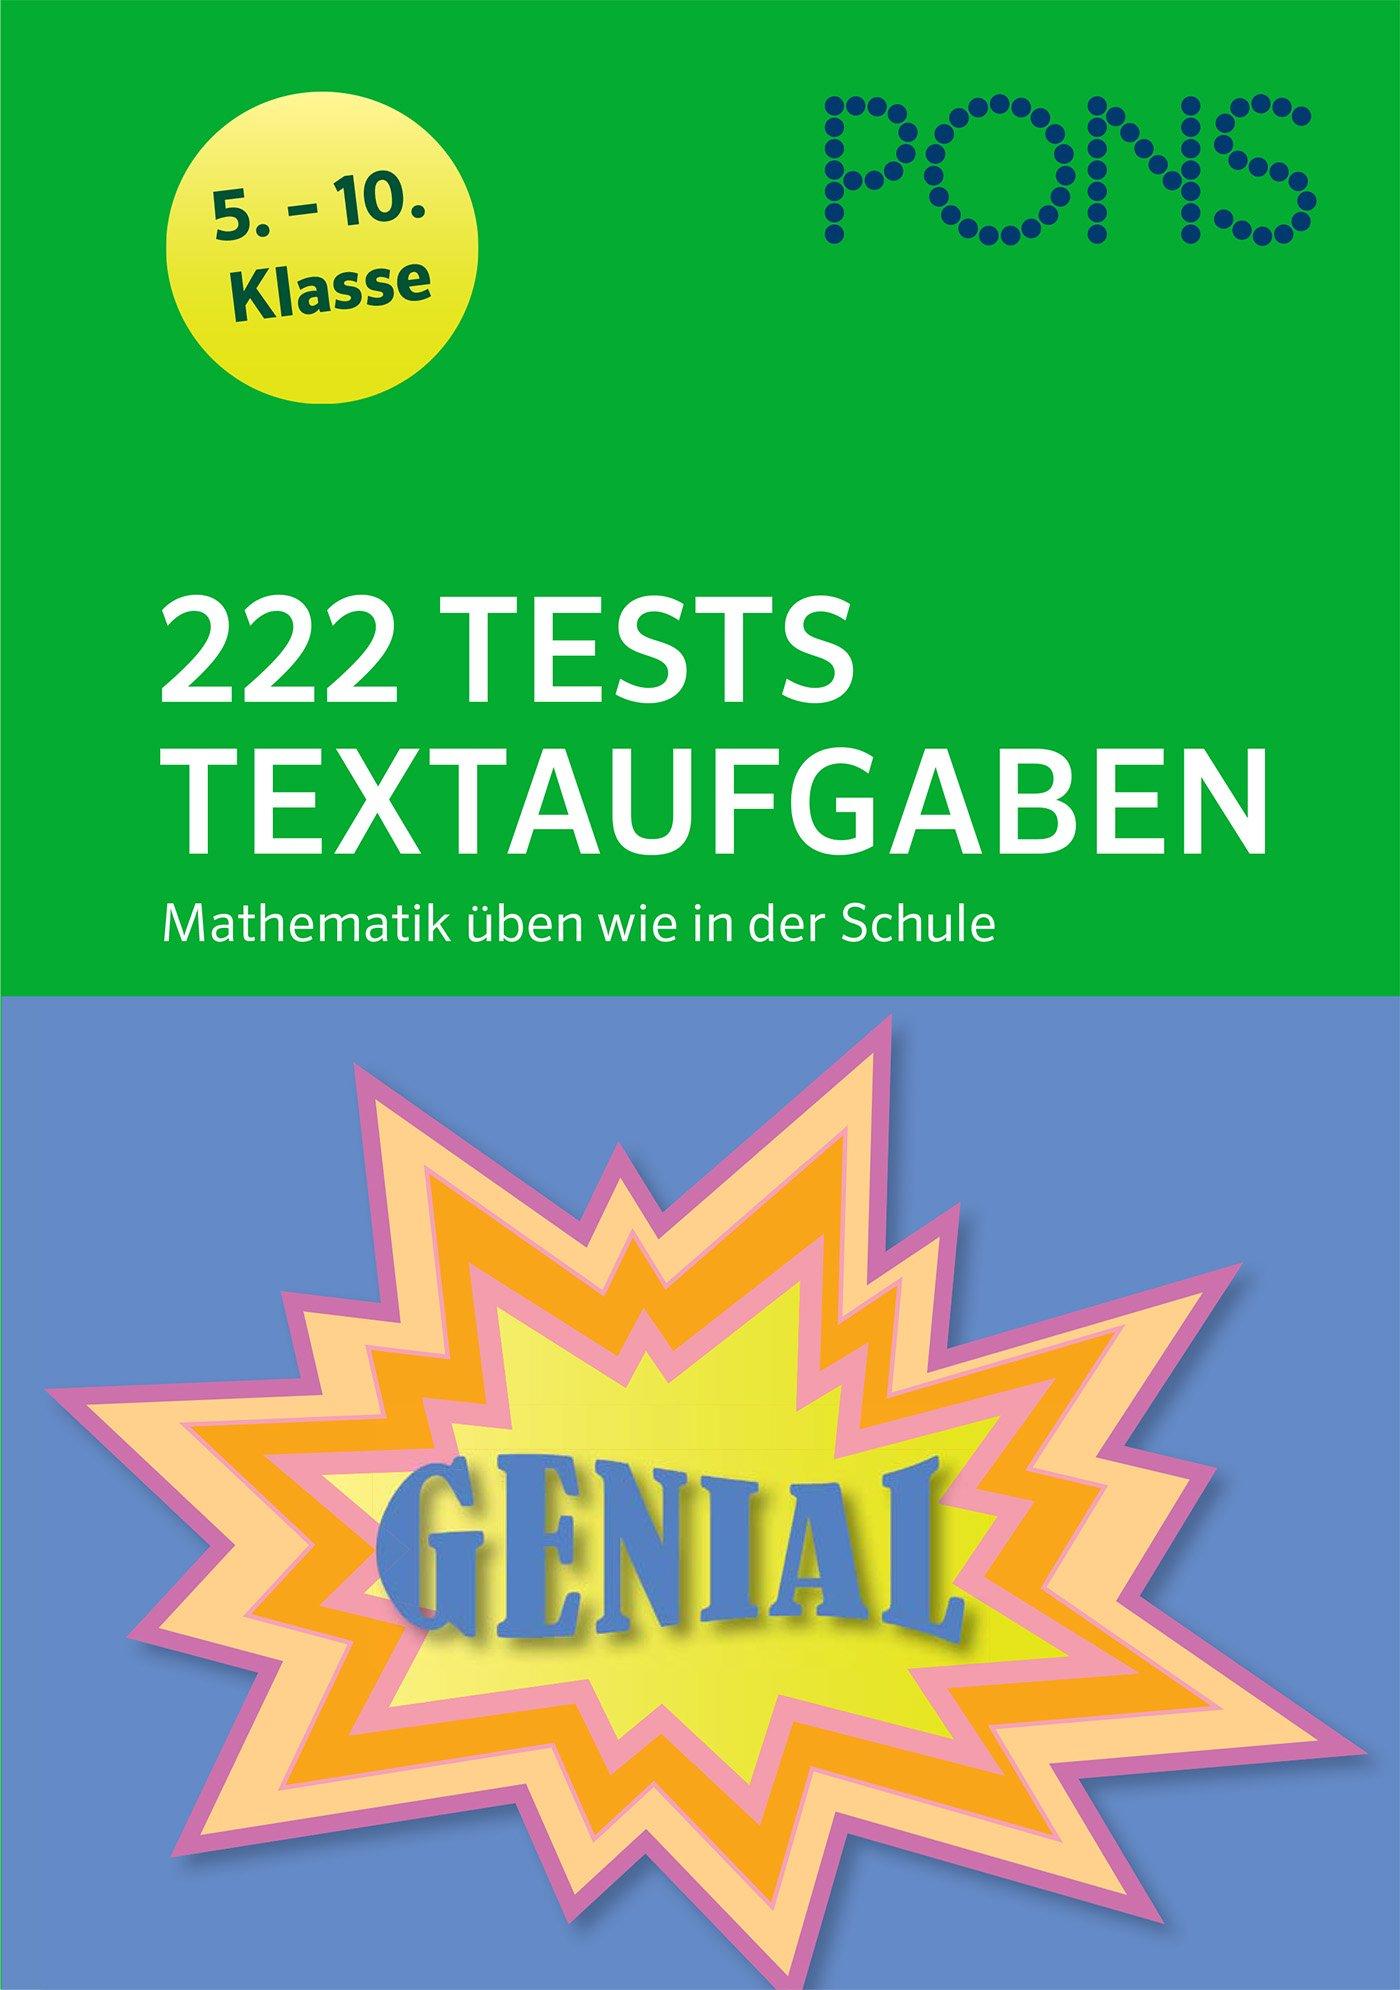 PONS 222 Mathematik-Tests Textaufgaben wie in der Schule: 5. - 10. Klasse (PONS 222 Tests)